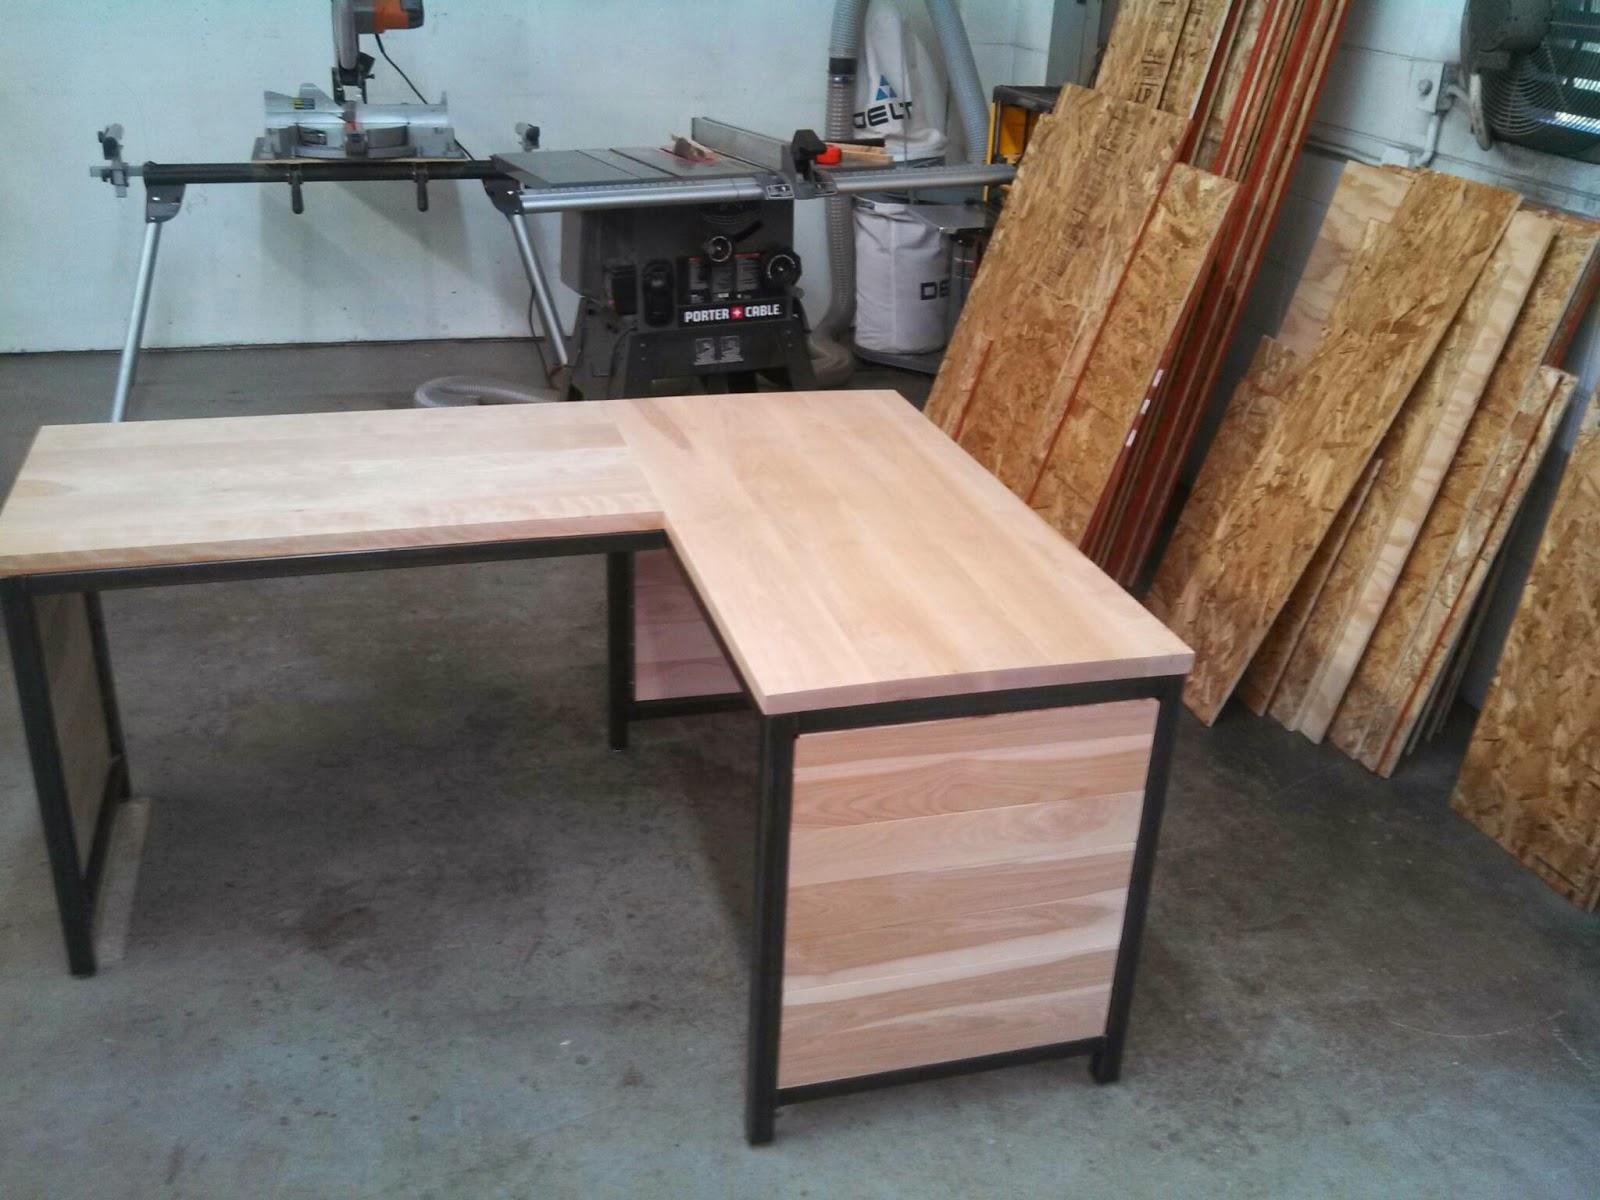 Real Industrial Edge Furniture llc: Office desk